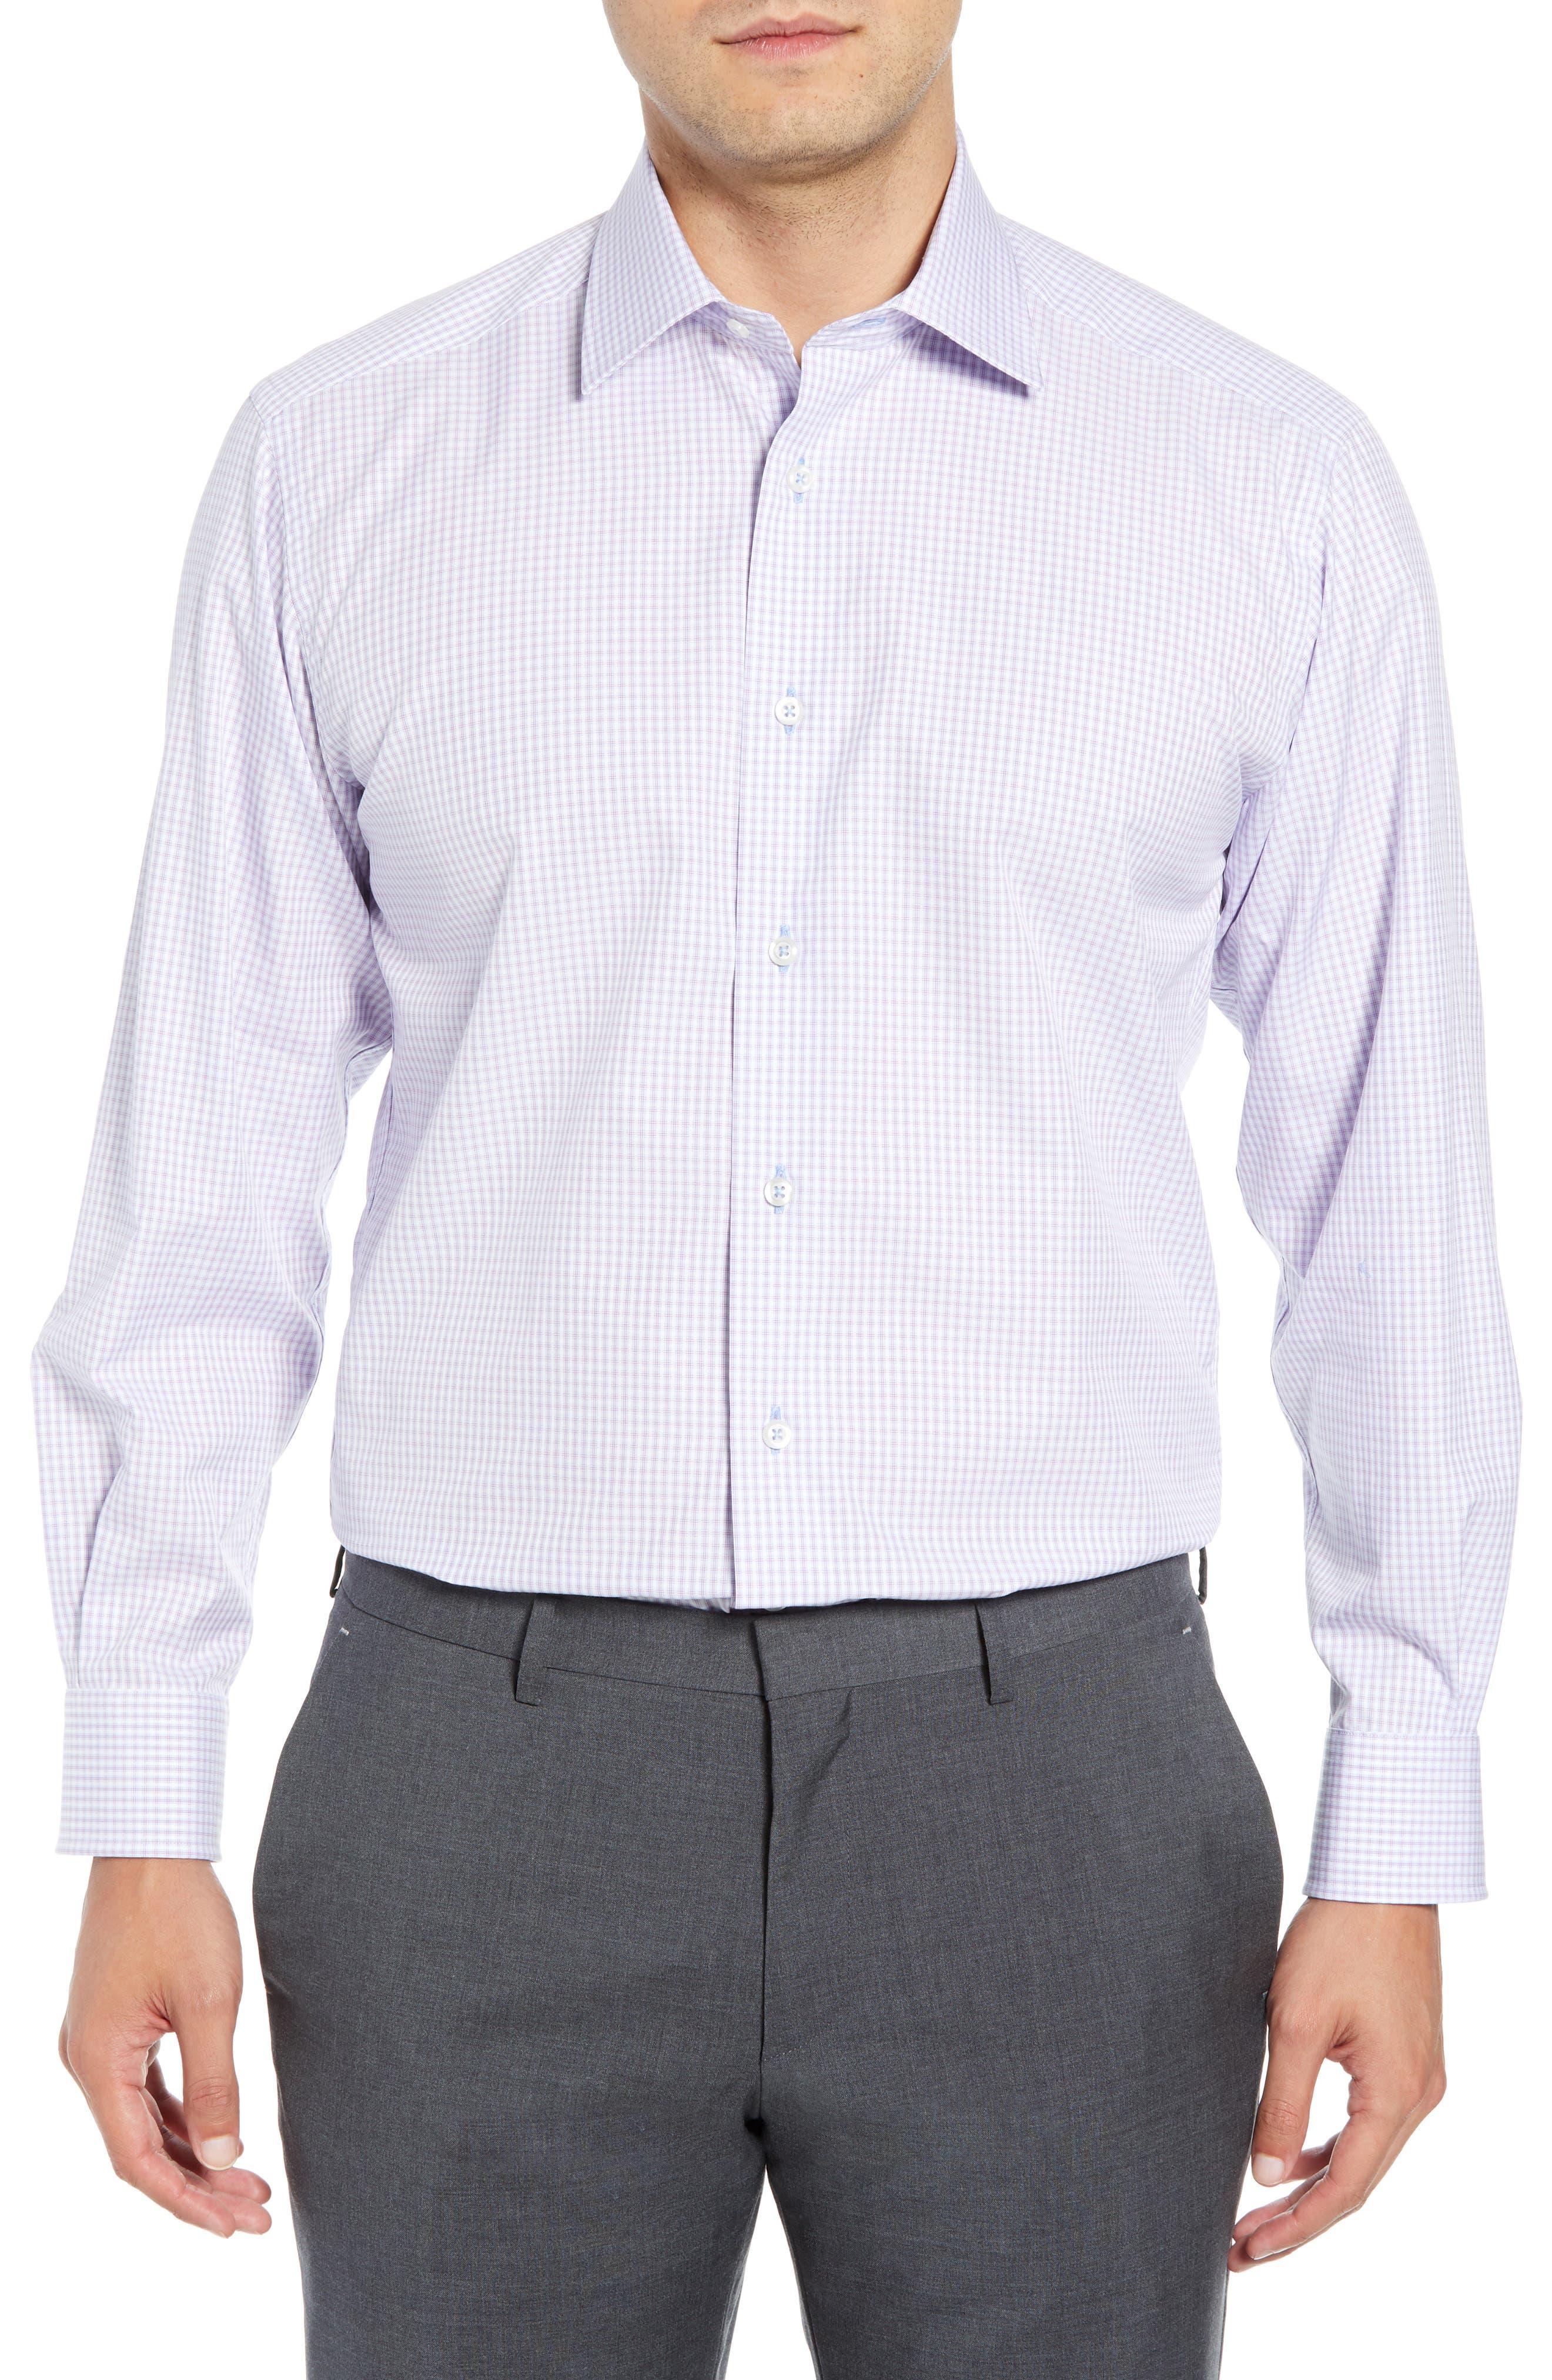 DAVID DONAHUE Men'S Regular-Fit Textured Plaid Dress Shirt in Berry